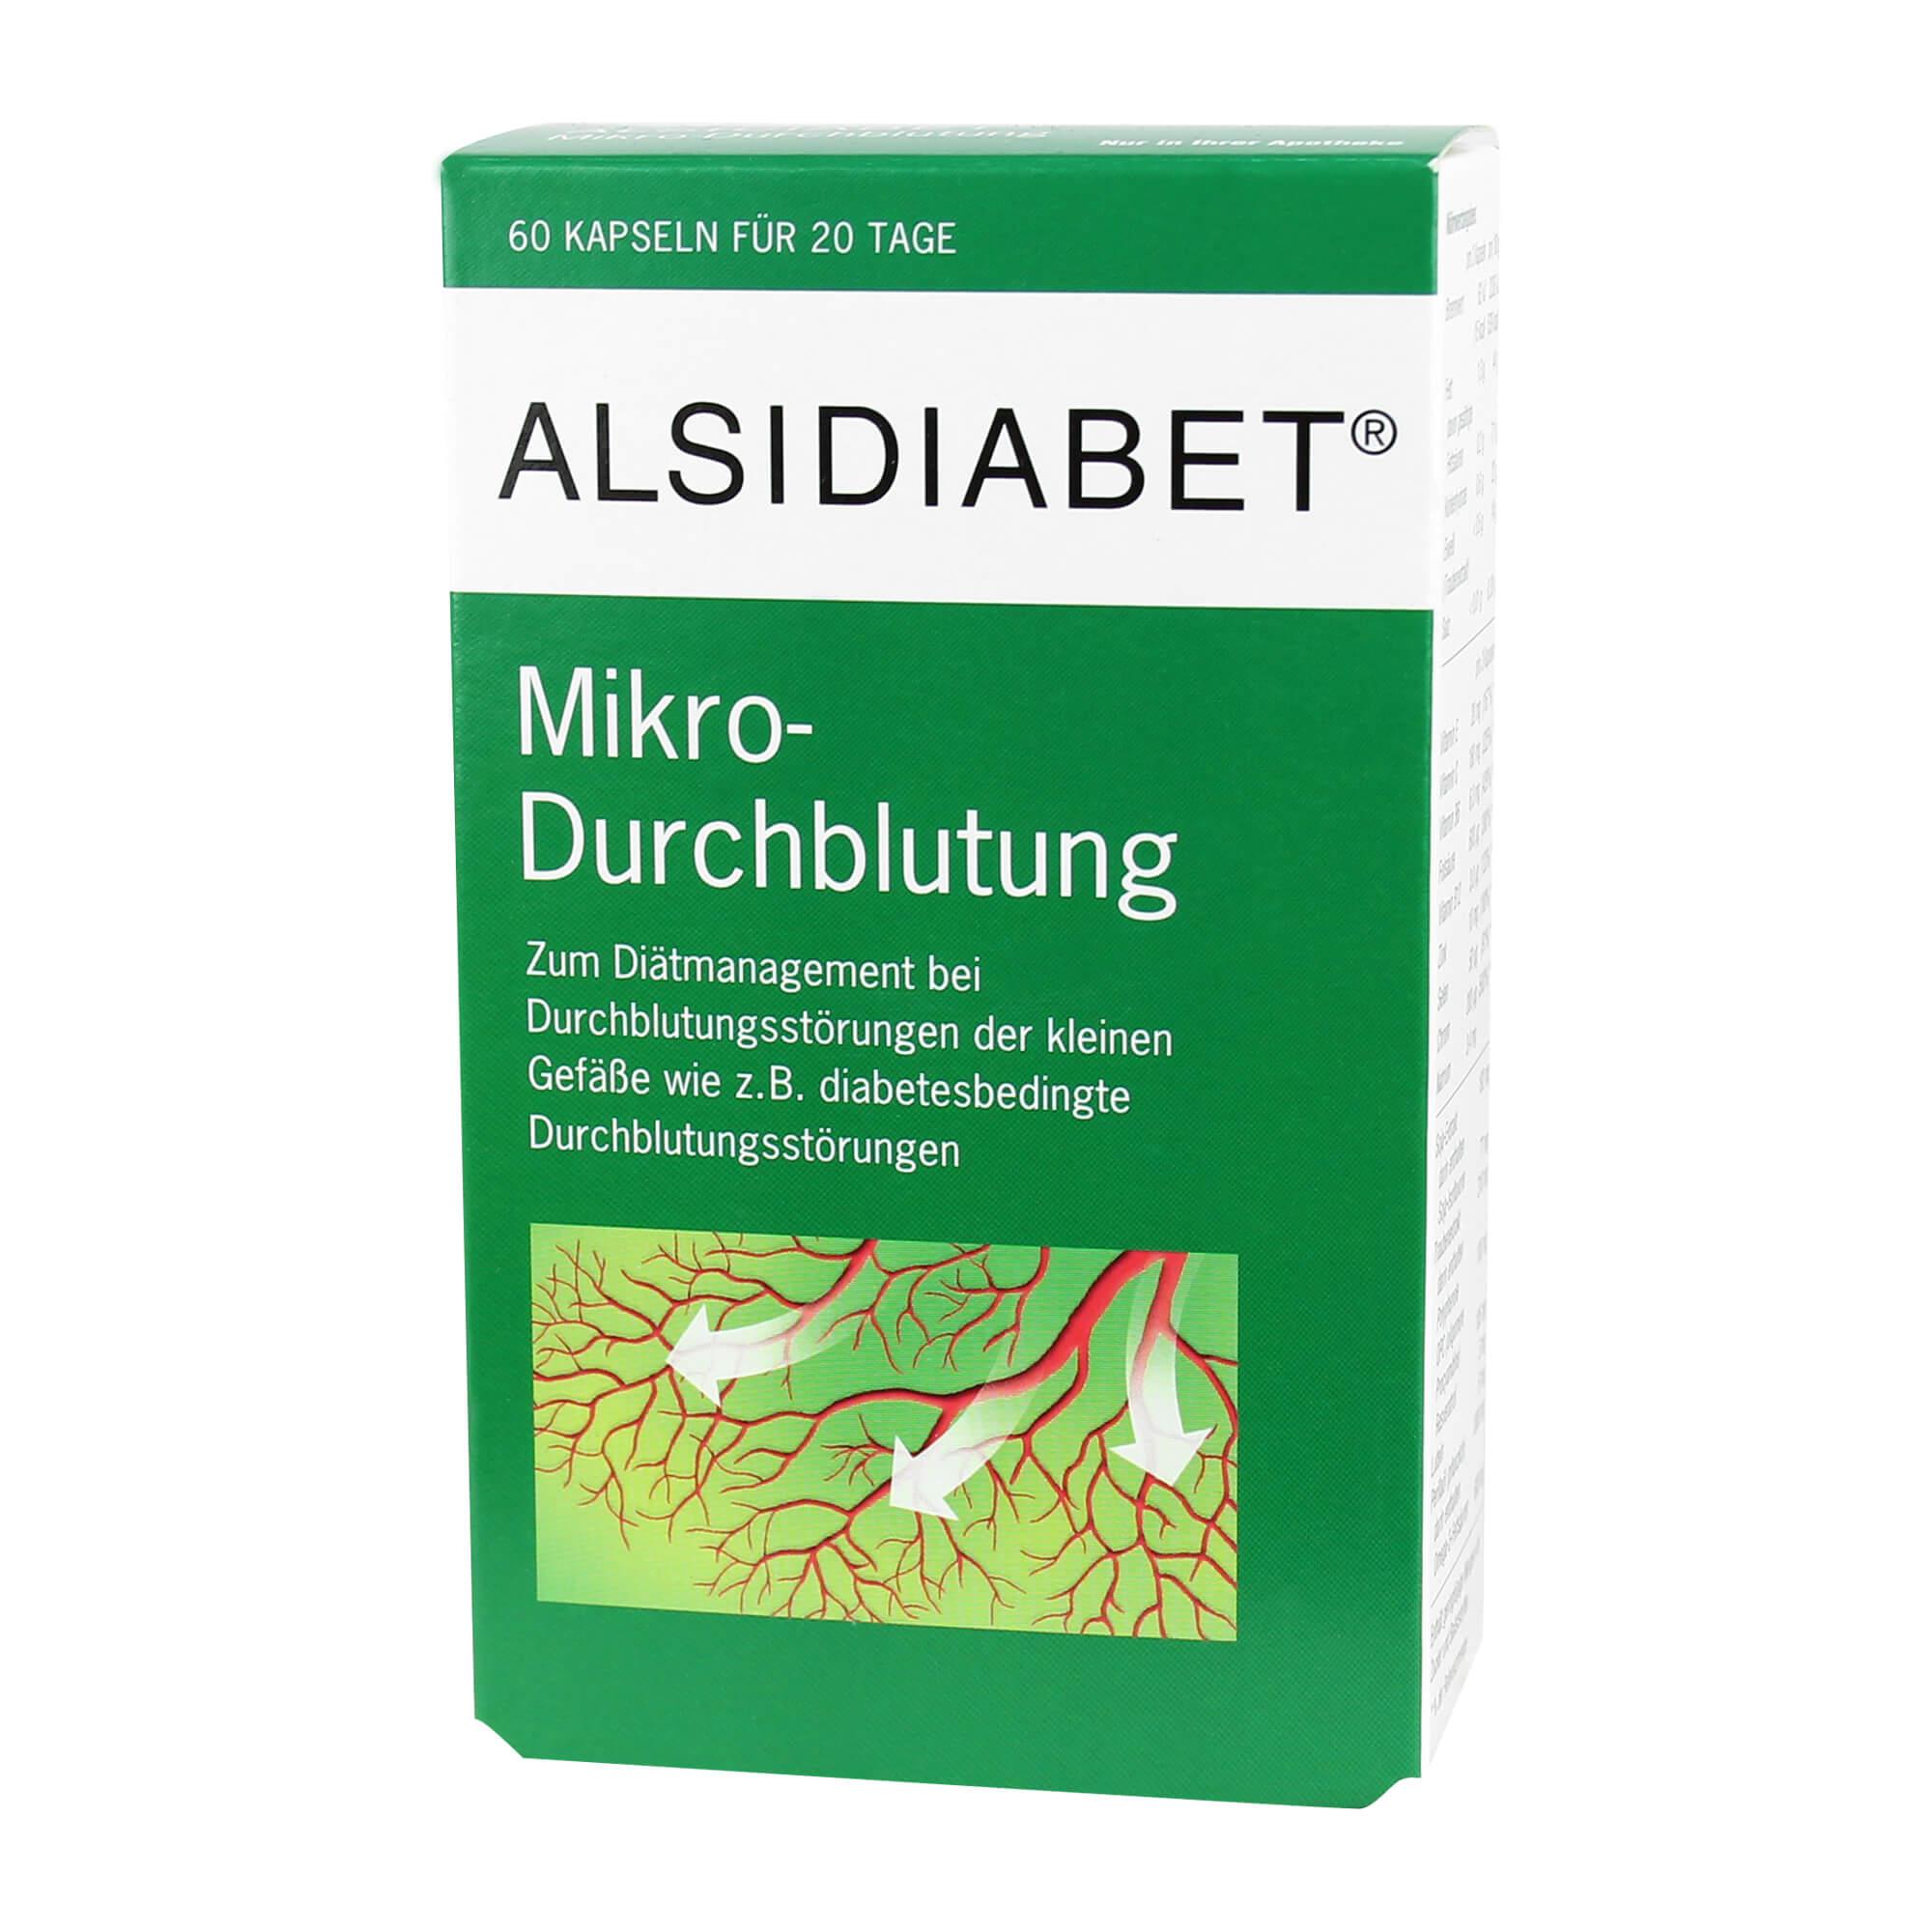 Alsidiabet Mikro-Durchblutung